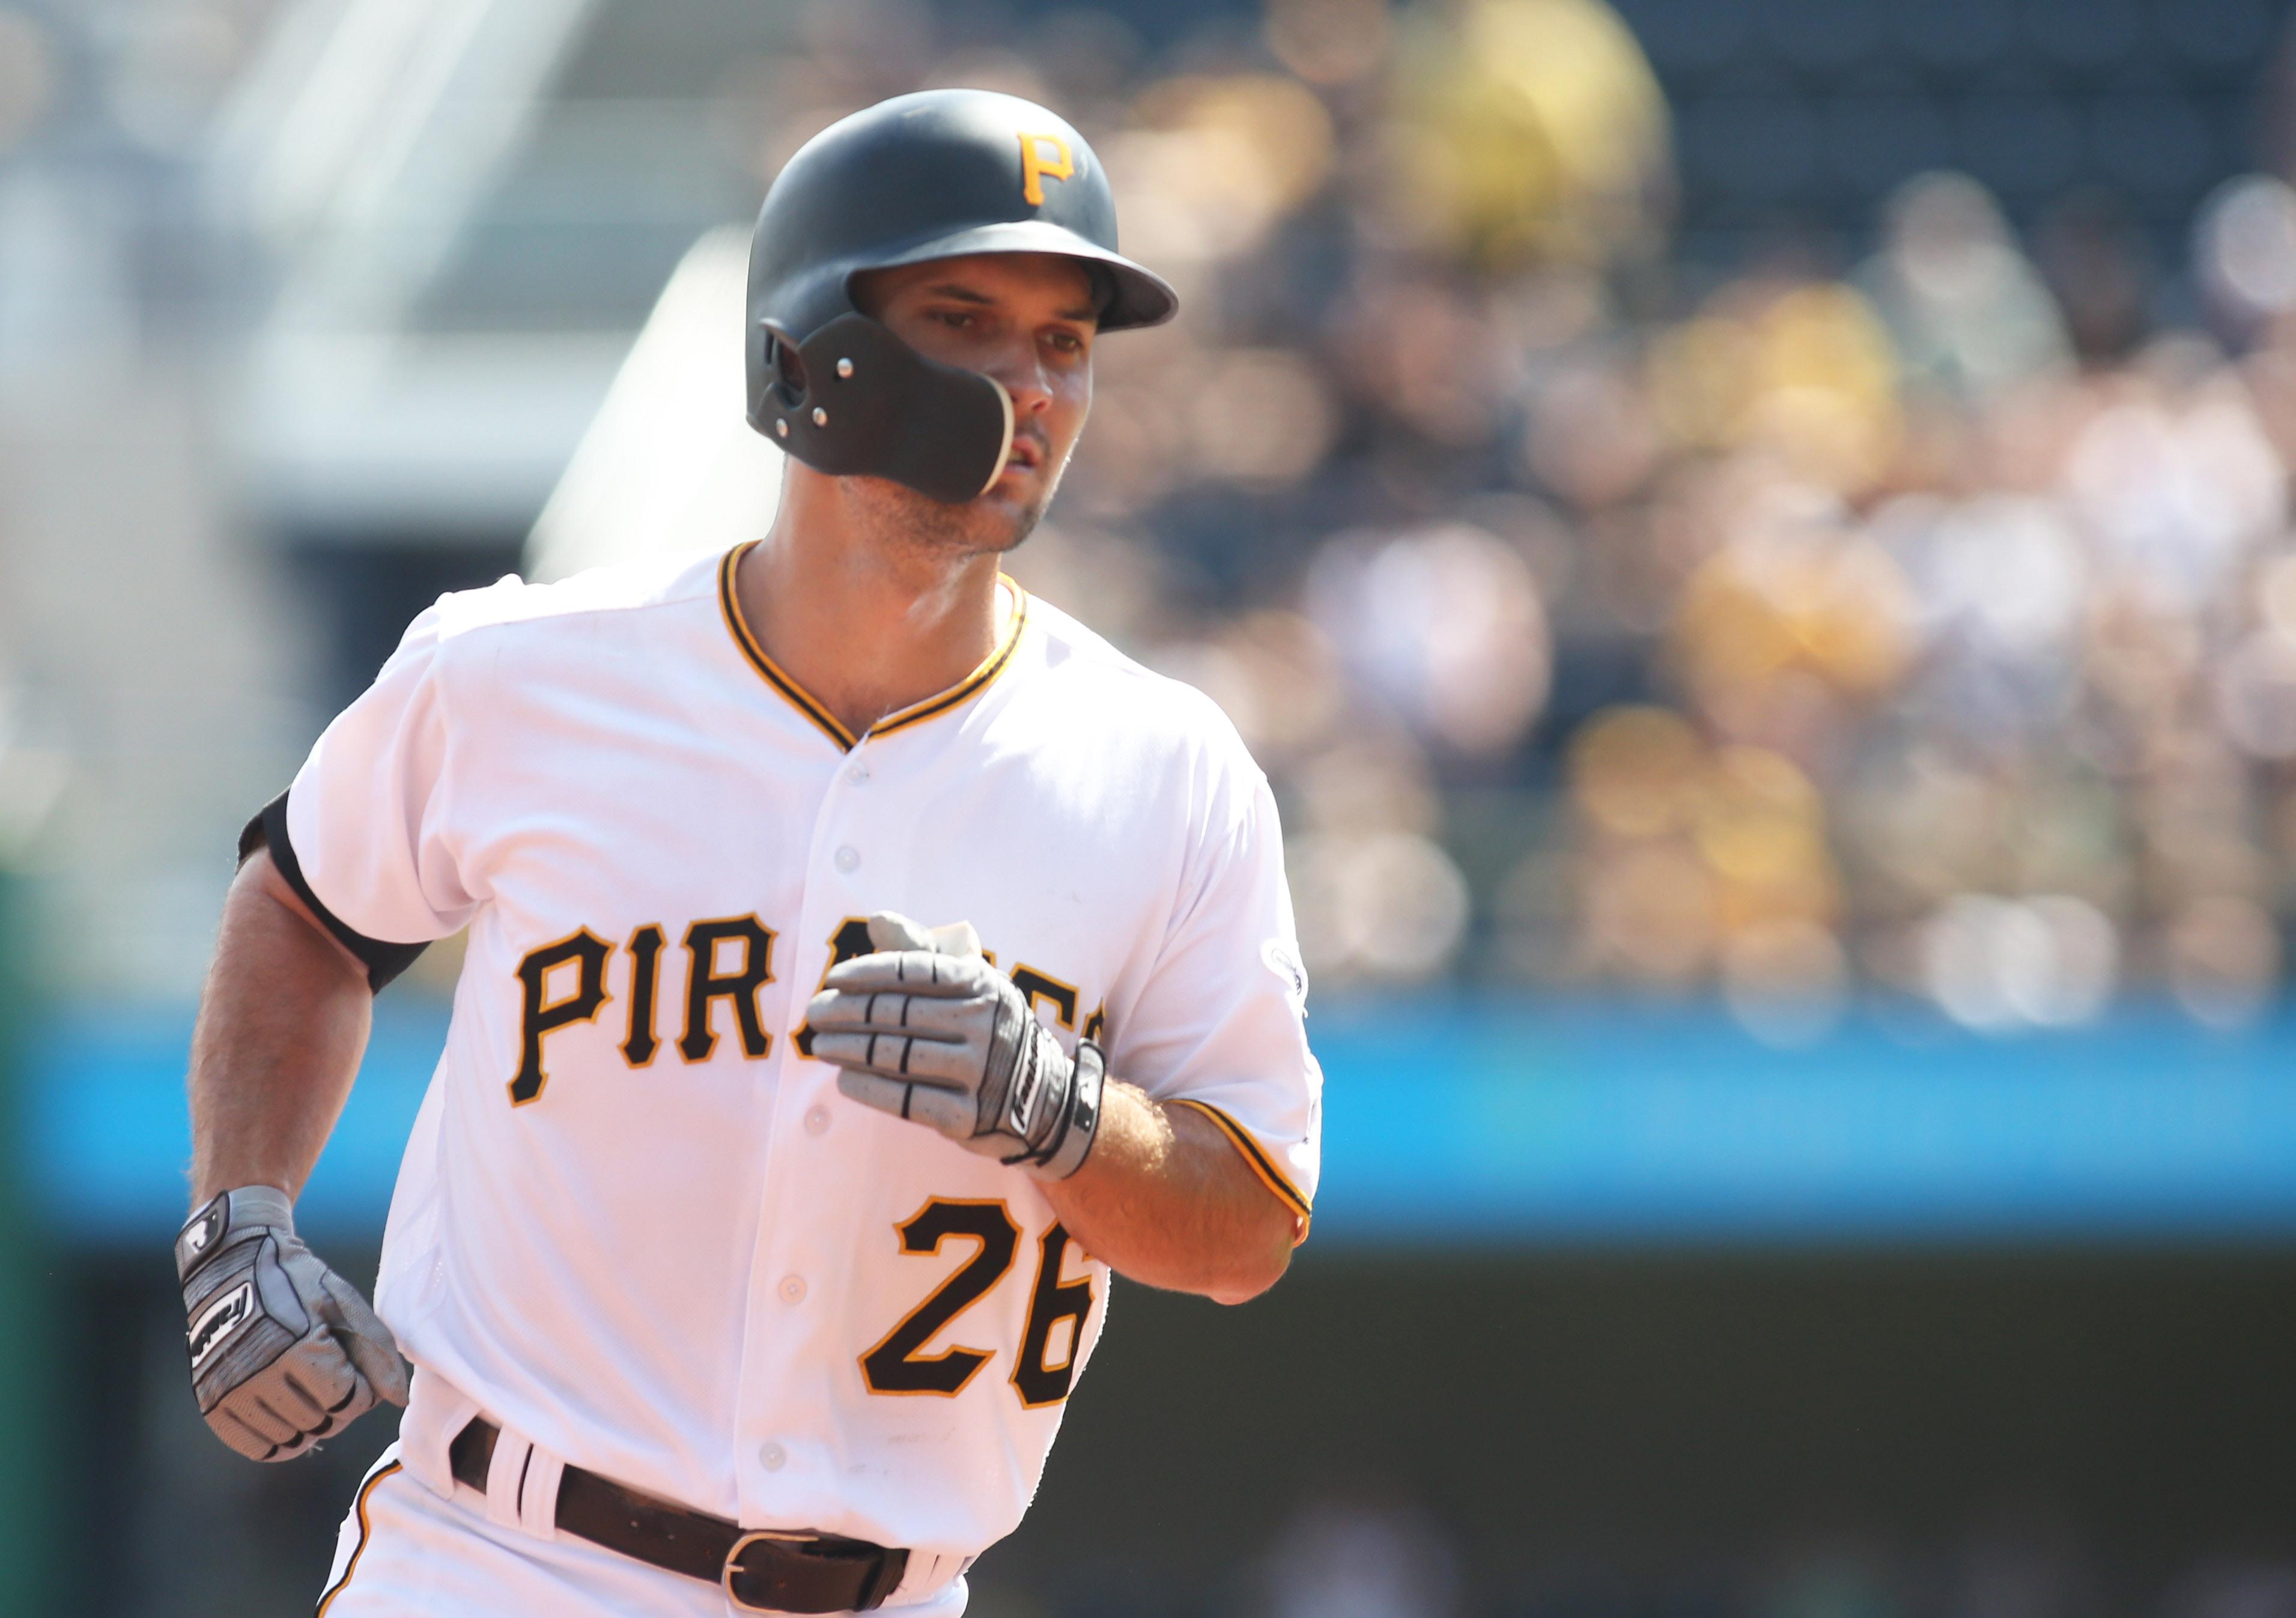 Pirates trade Adam Frazier to the Padres